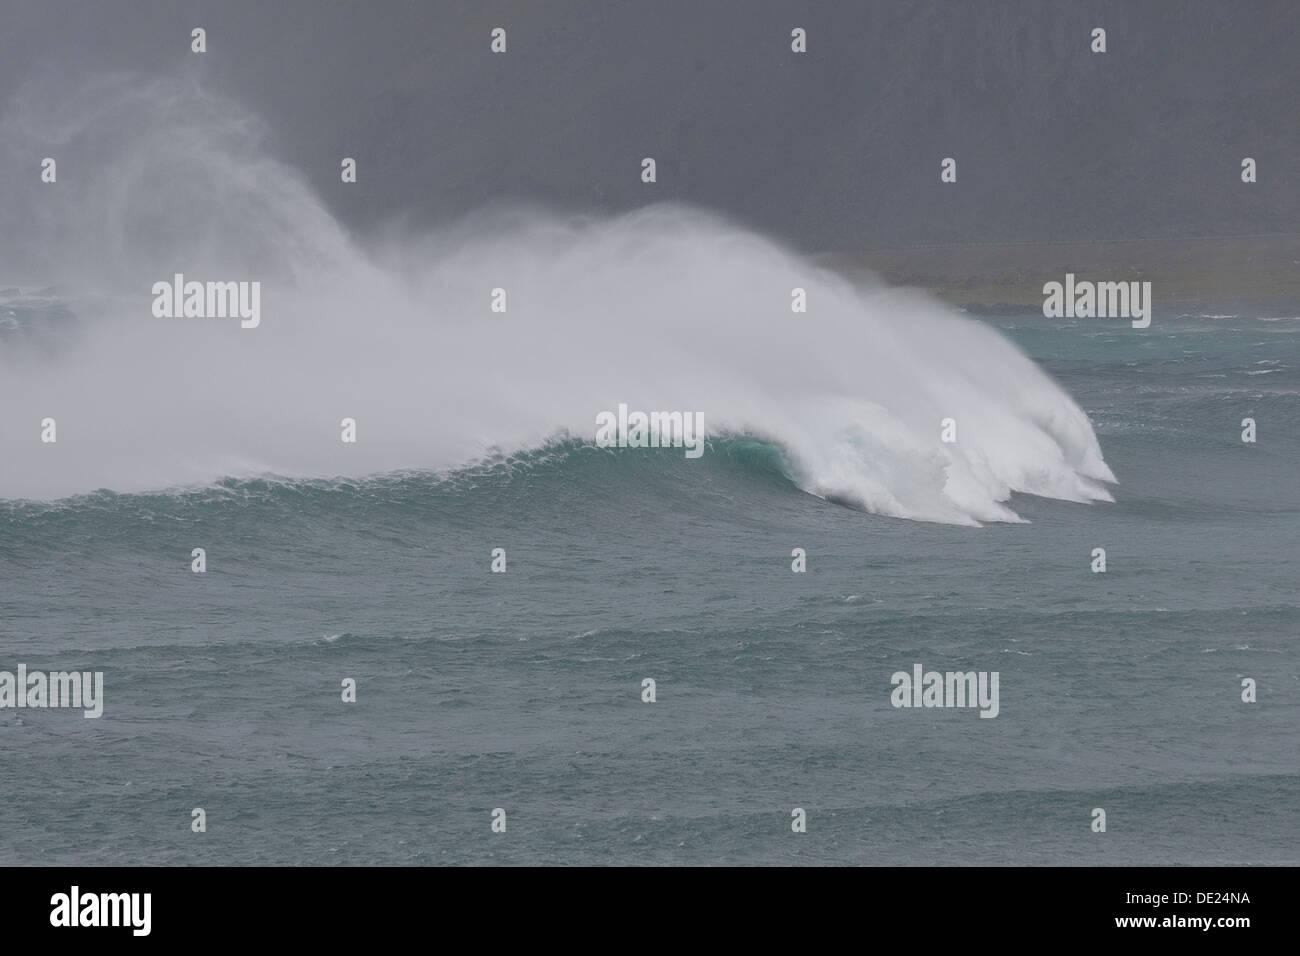 Ozean, Meer, Brandung, Welle, Wellenbrecher, Wellen, Brandung, Gischt, Meer, Flut, starker Wellengang, Wellen, Welle, Stockbild